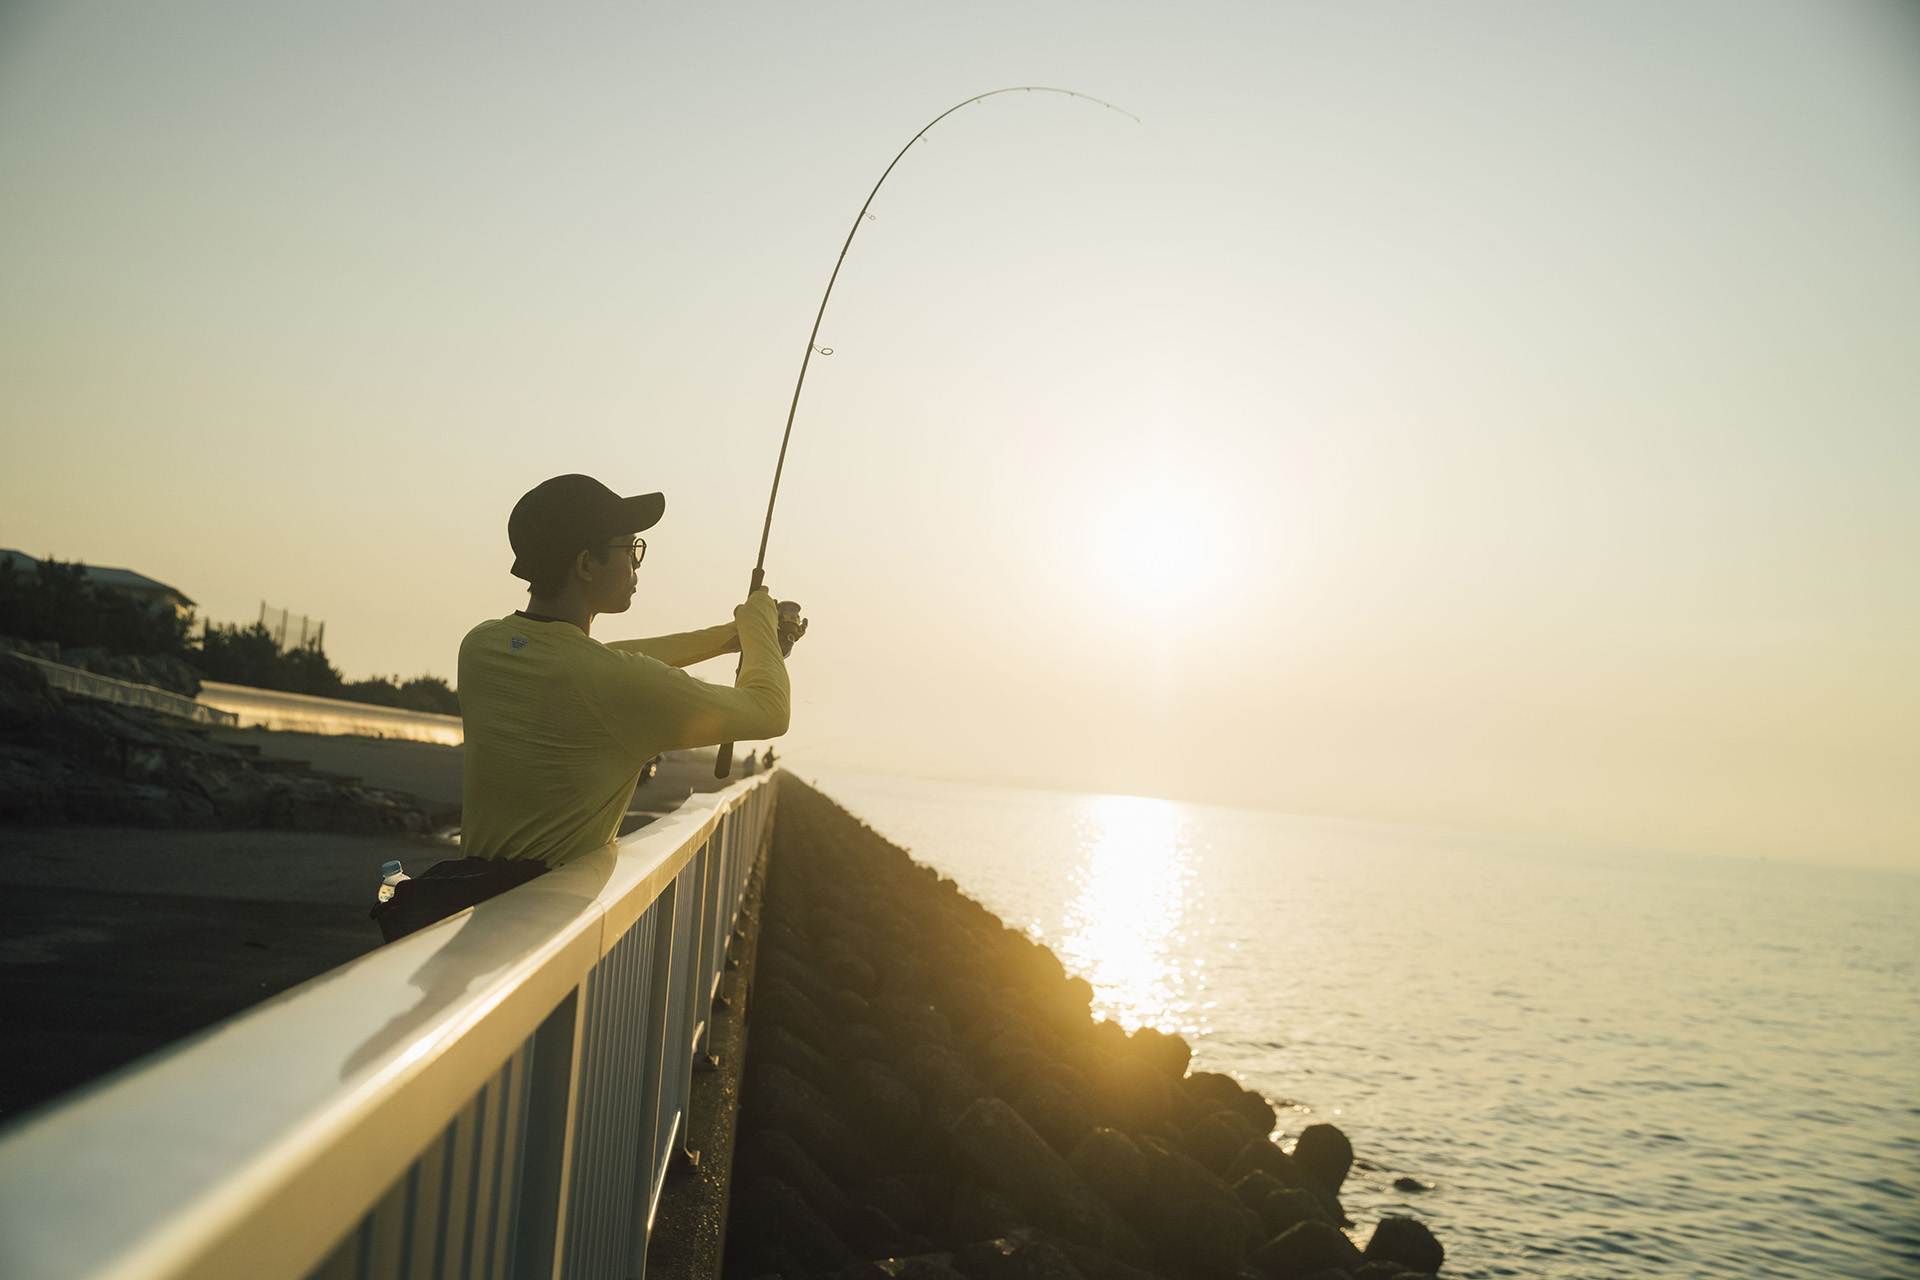 1 Yogee New Waves・粕谷哲司の音楽と釣りを愛するライフスタイル